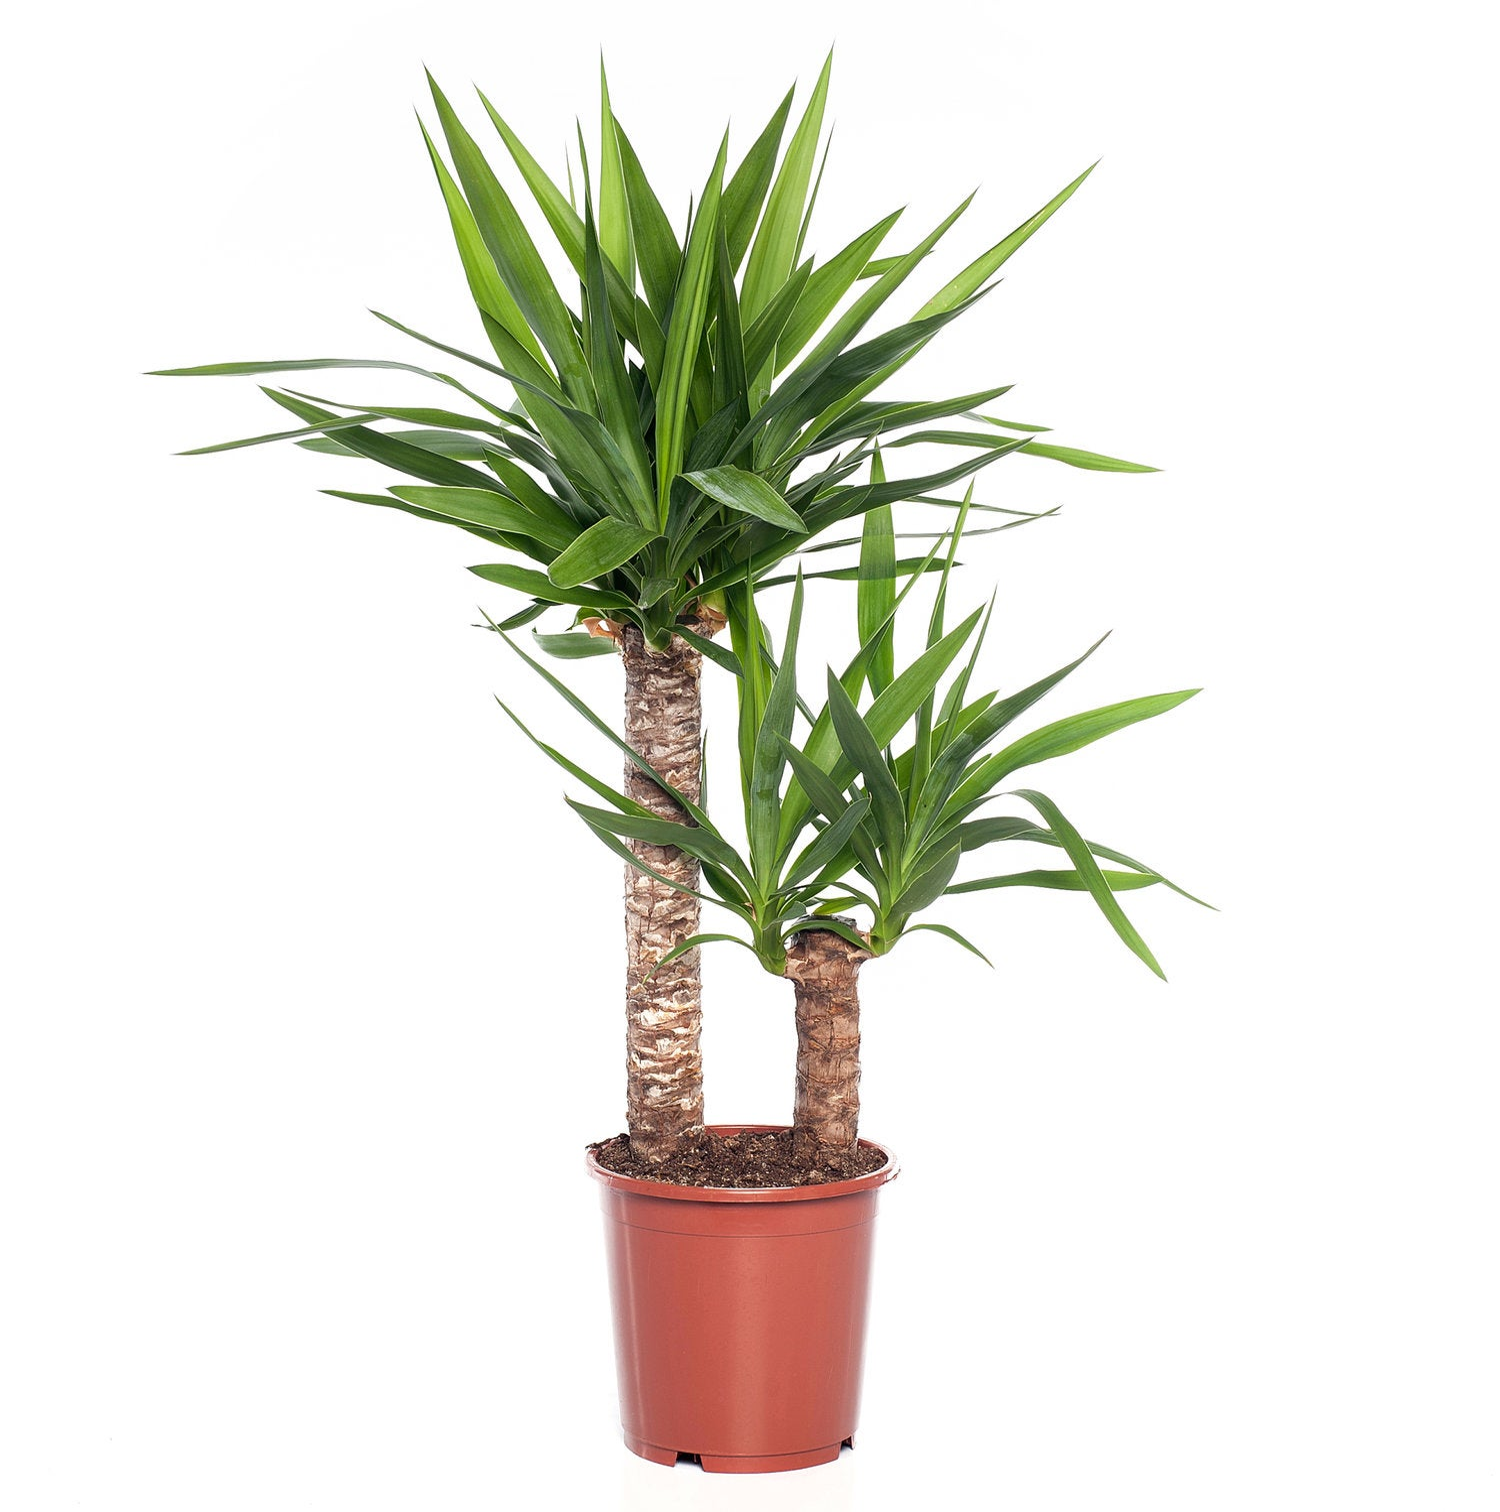 Yucca (Yucca elephantipes) D 21 H 90 cm